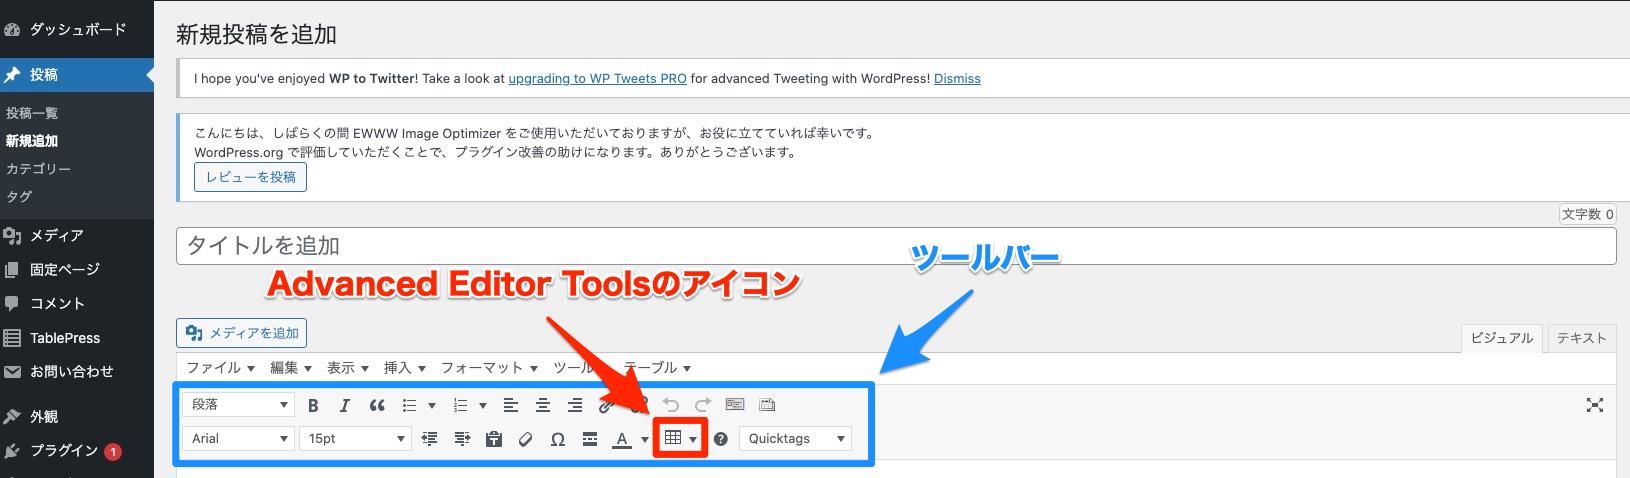 Advanced Editor Tools アイコン ツールバー